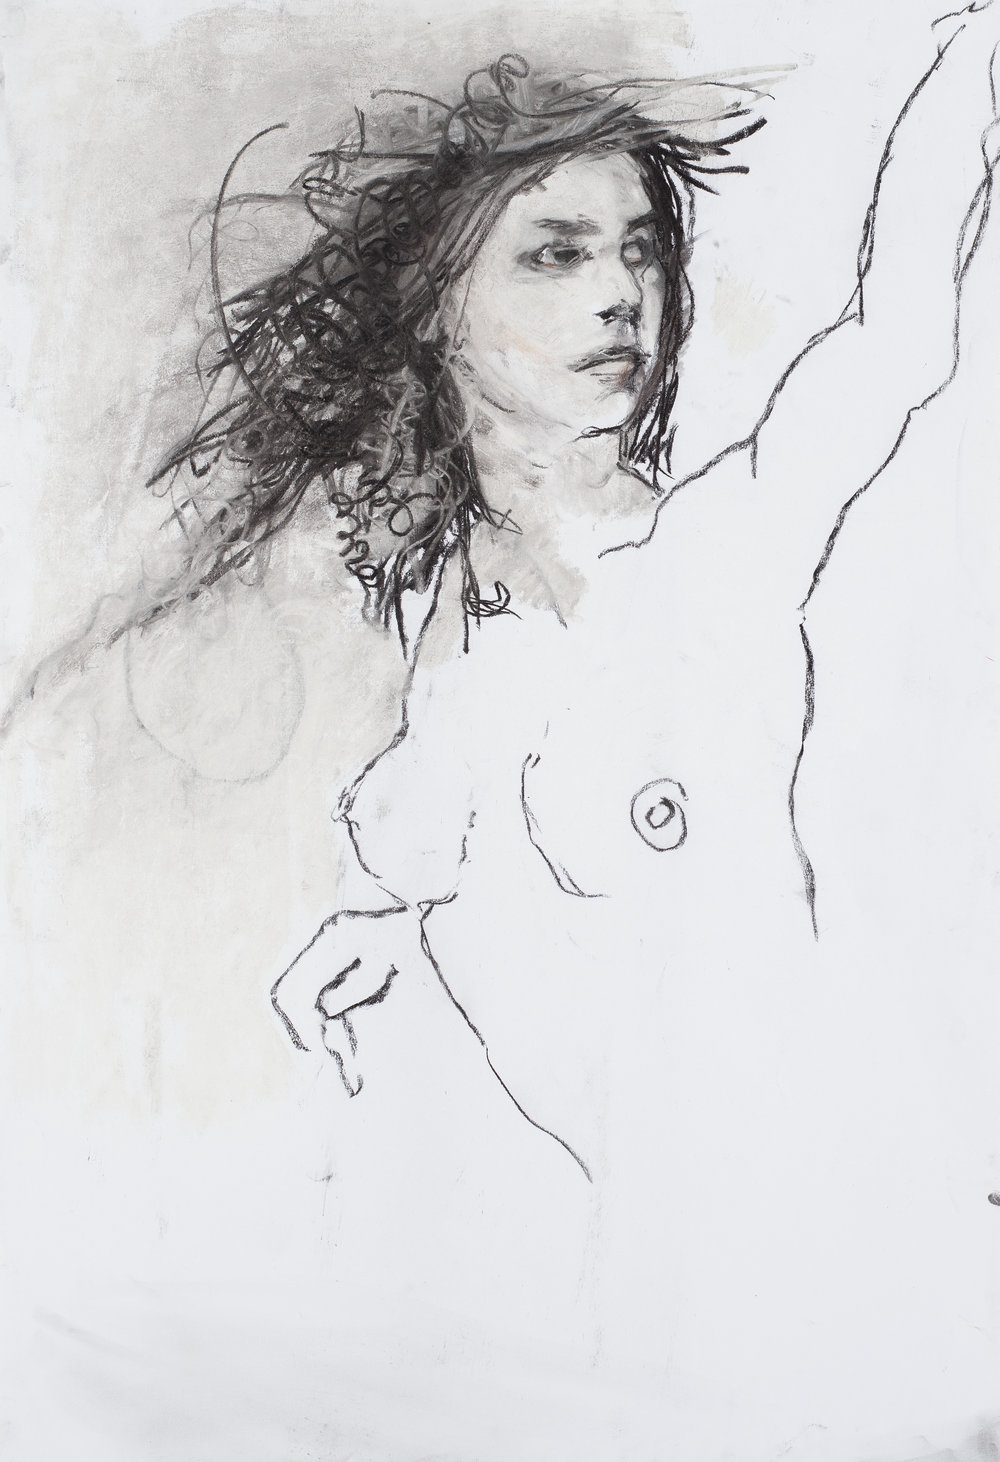 Eros couronné de roses 2 - 201675 x 110 cm